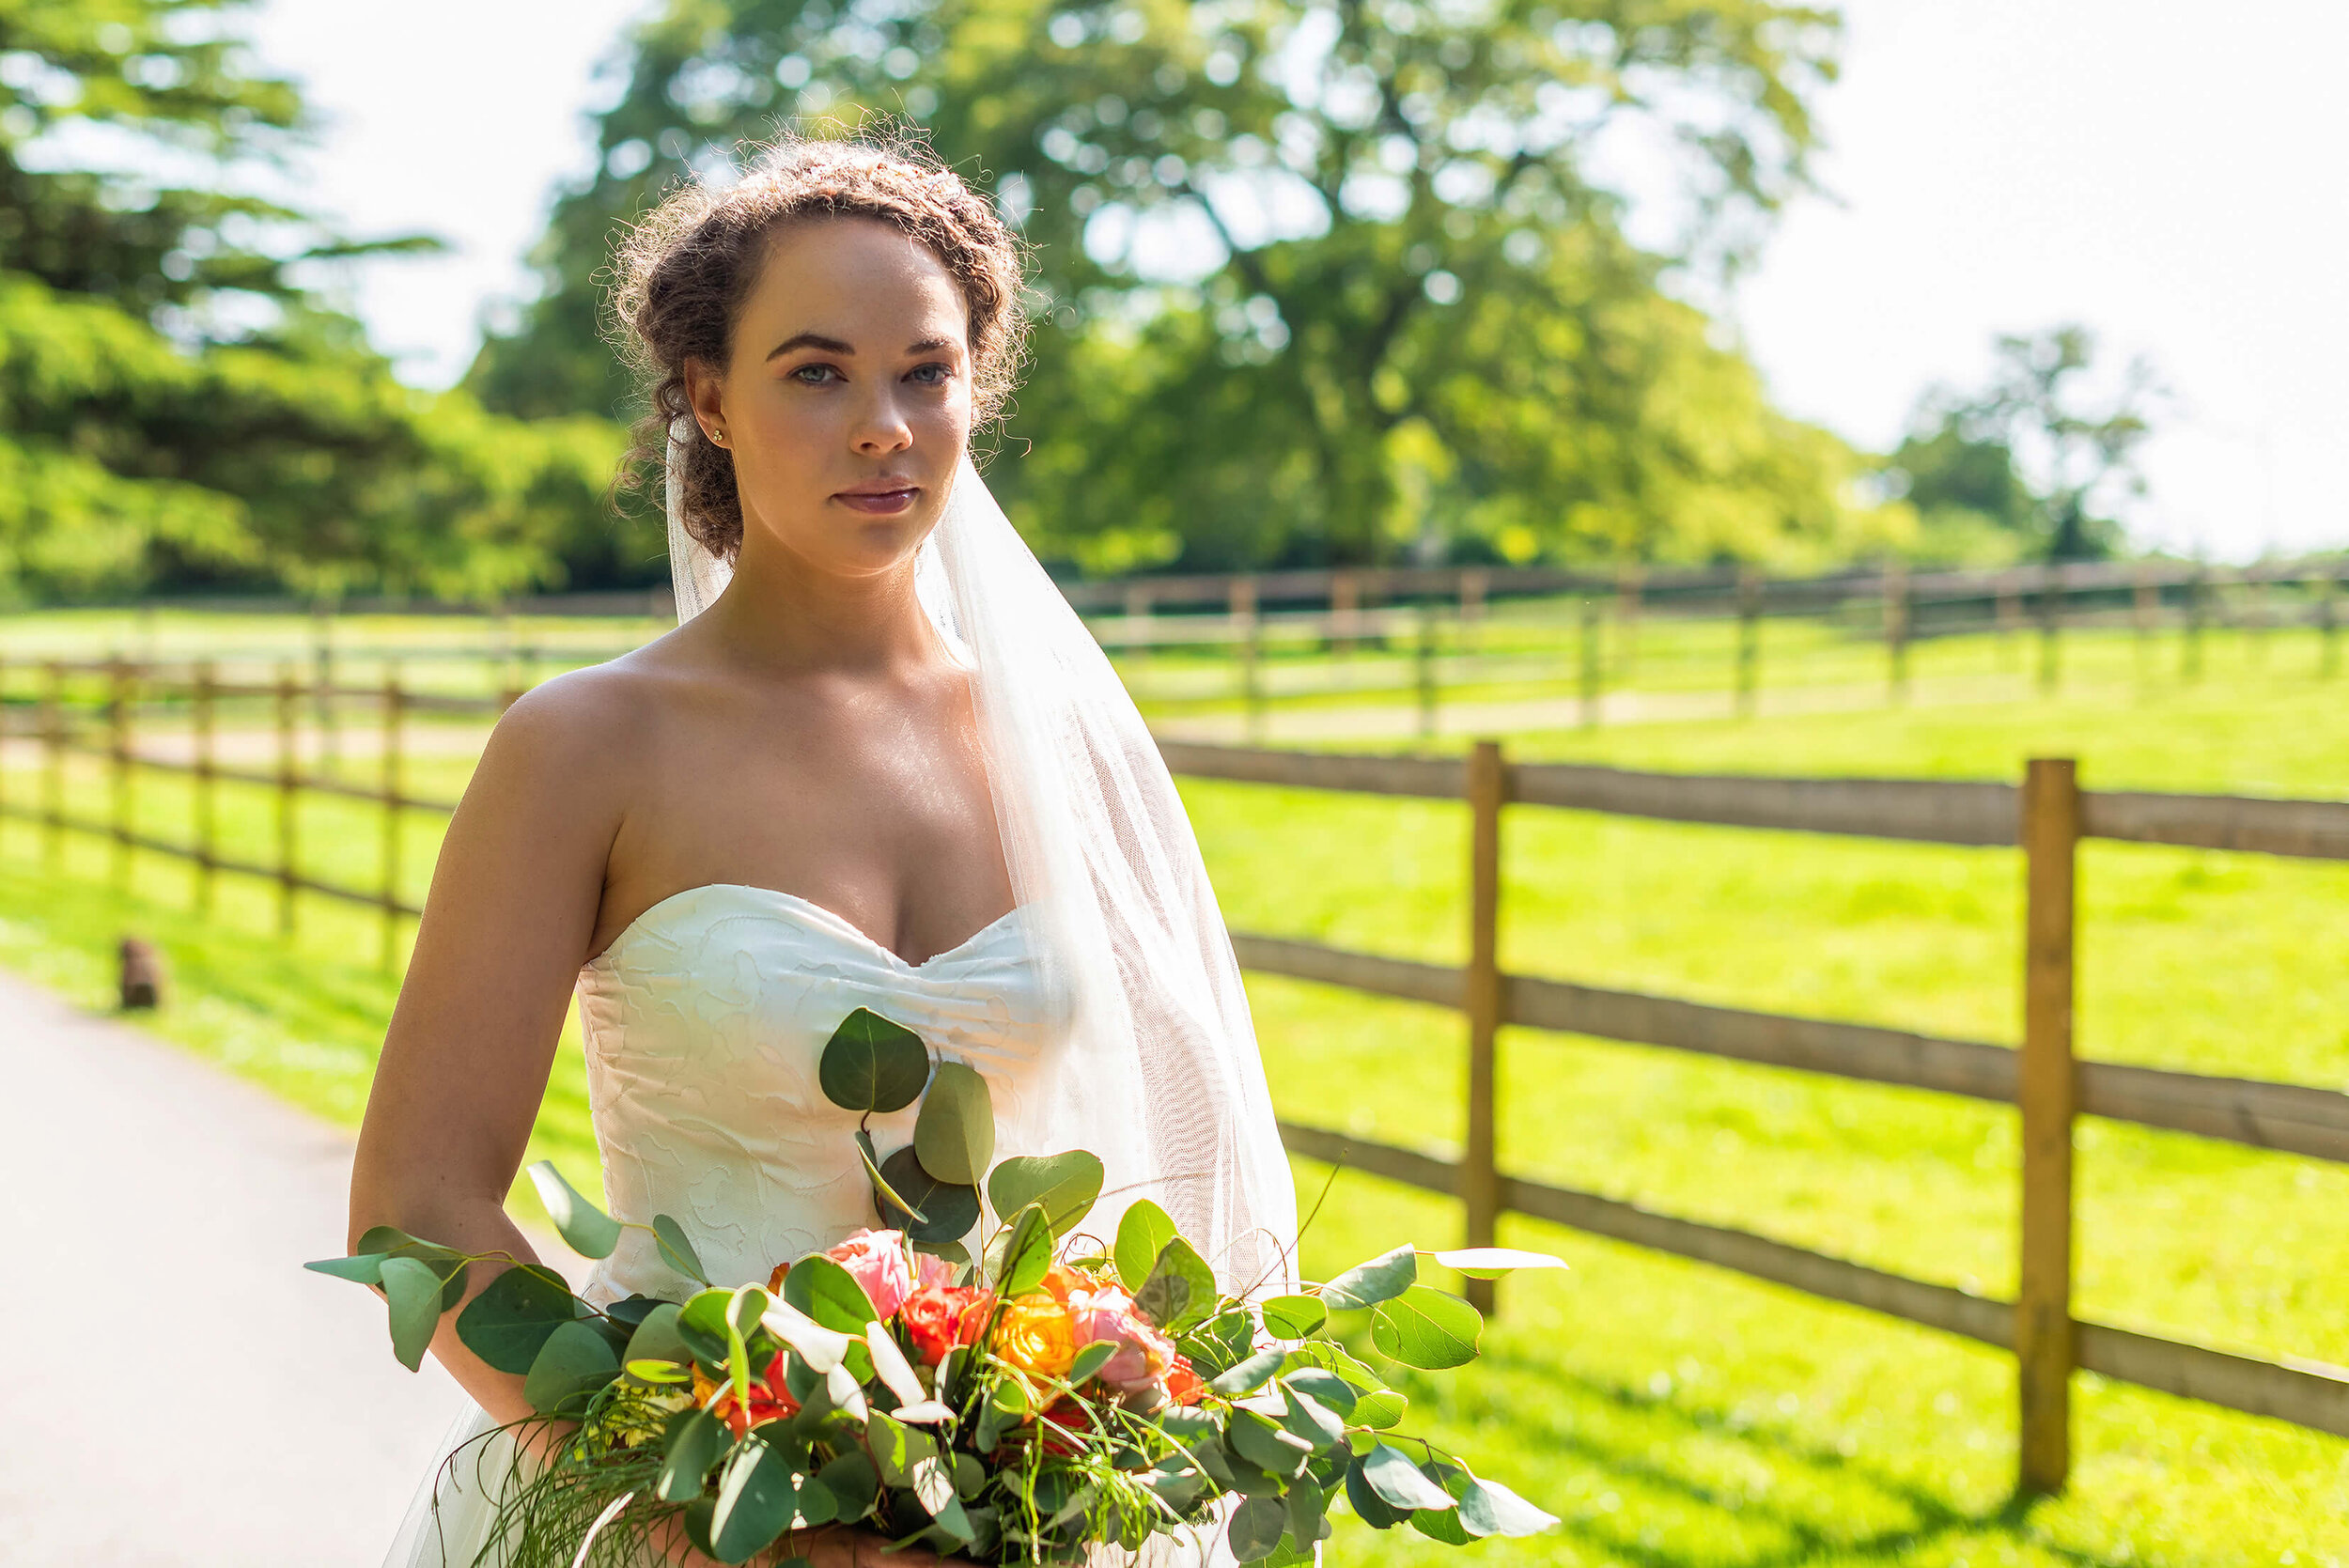 Bride in Oui Madam Bridal Atelier dress, with Davina Simone Weddings floral and foliage bouquet and Sash & Veil Bridal veil at Nurstead Court Wedding Venue, Kent.